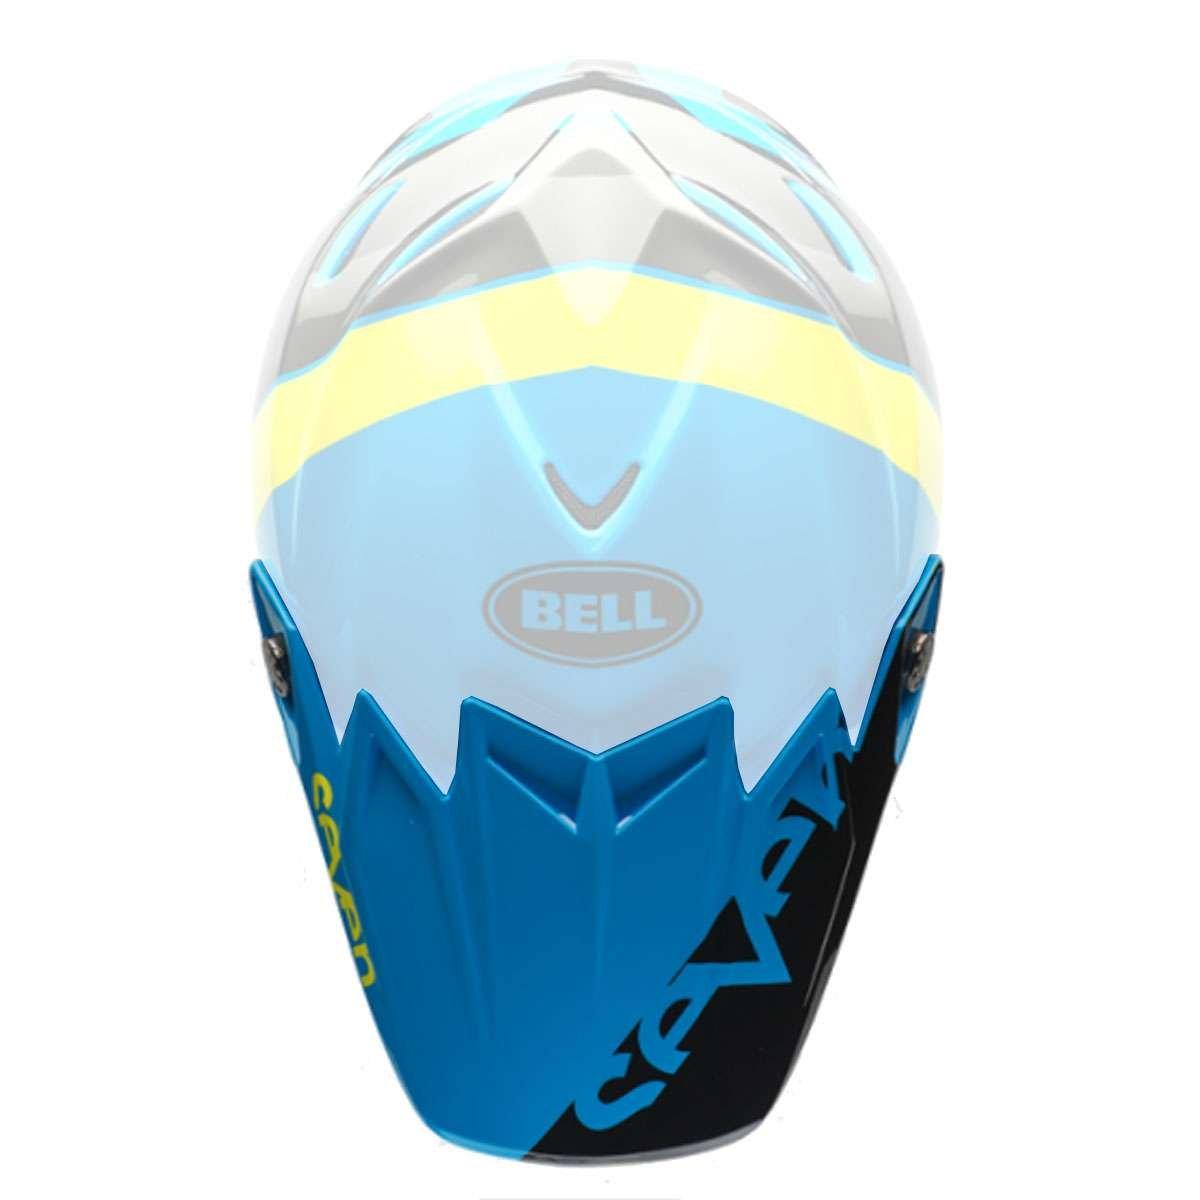 Bell Powersports Moto-9 Flex Helmet - Replacement Visor - Seven Blue/Yellow - 7080406